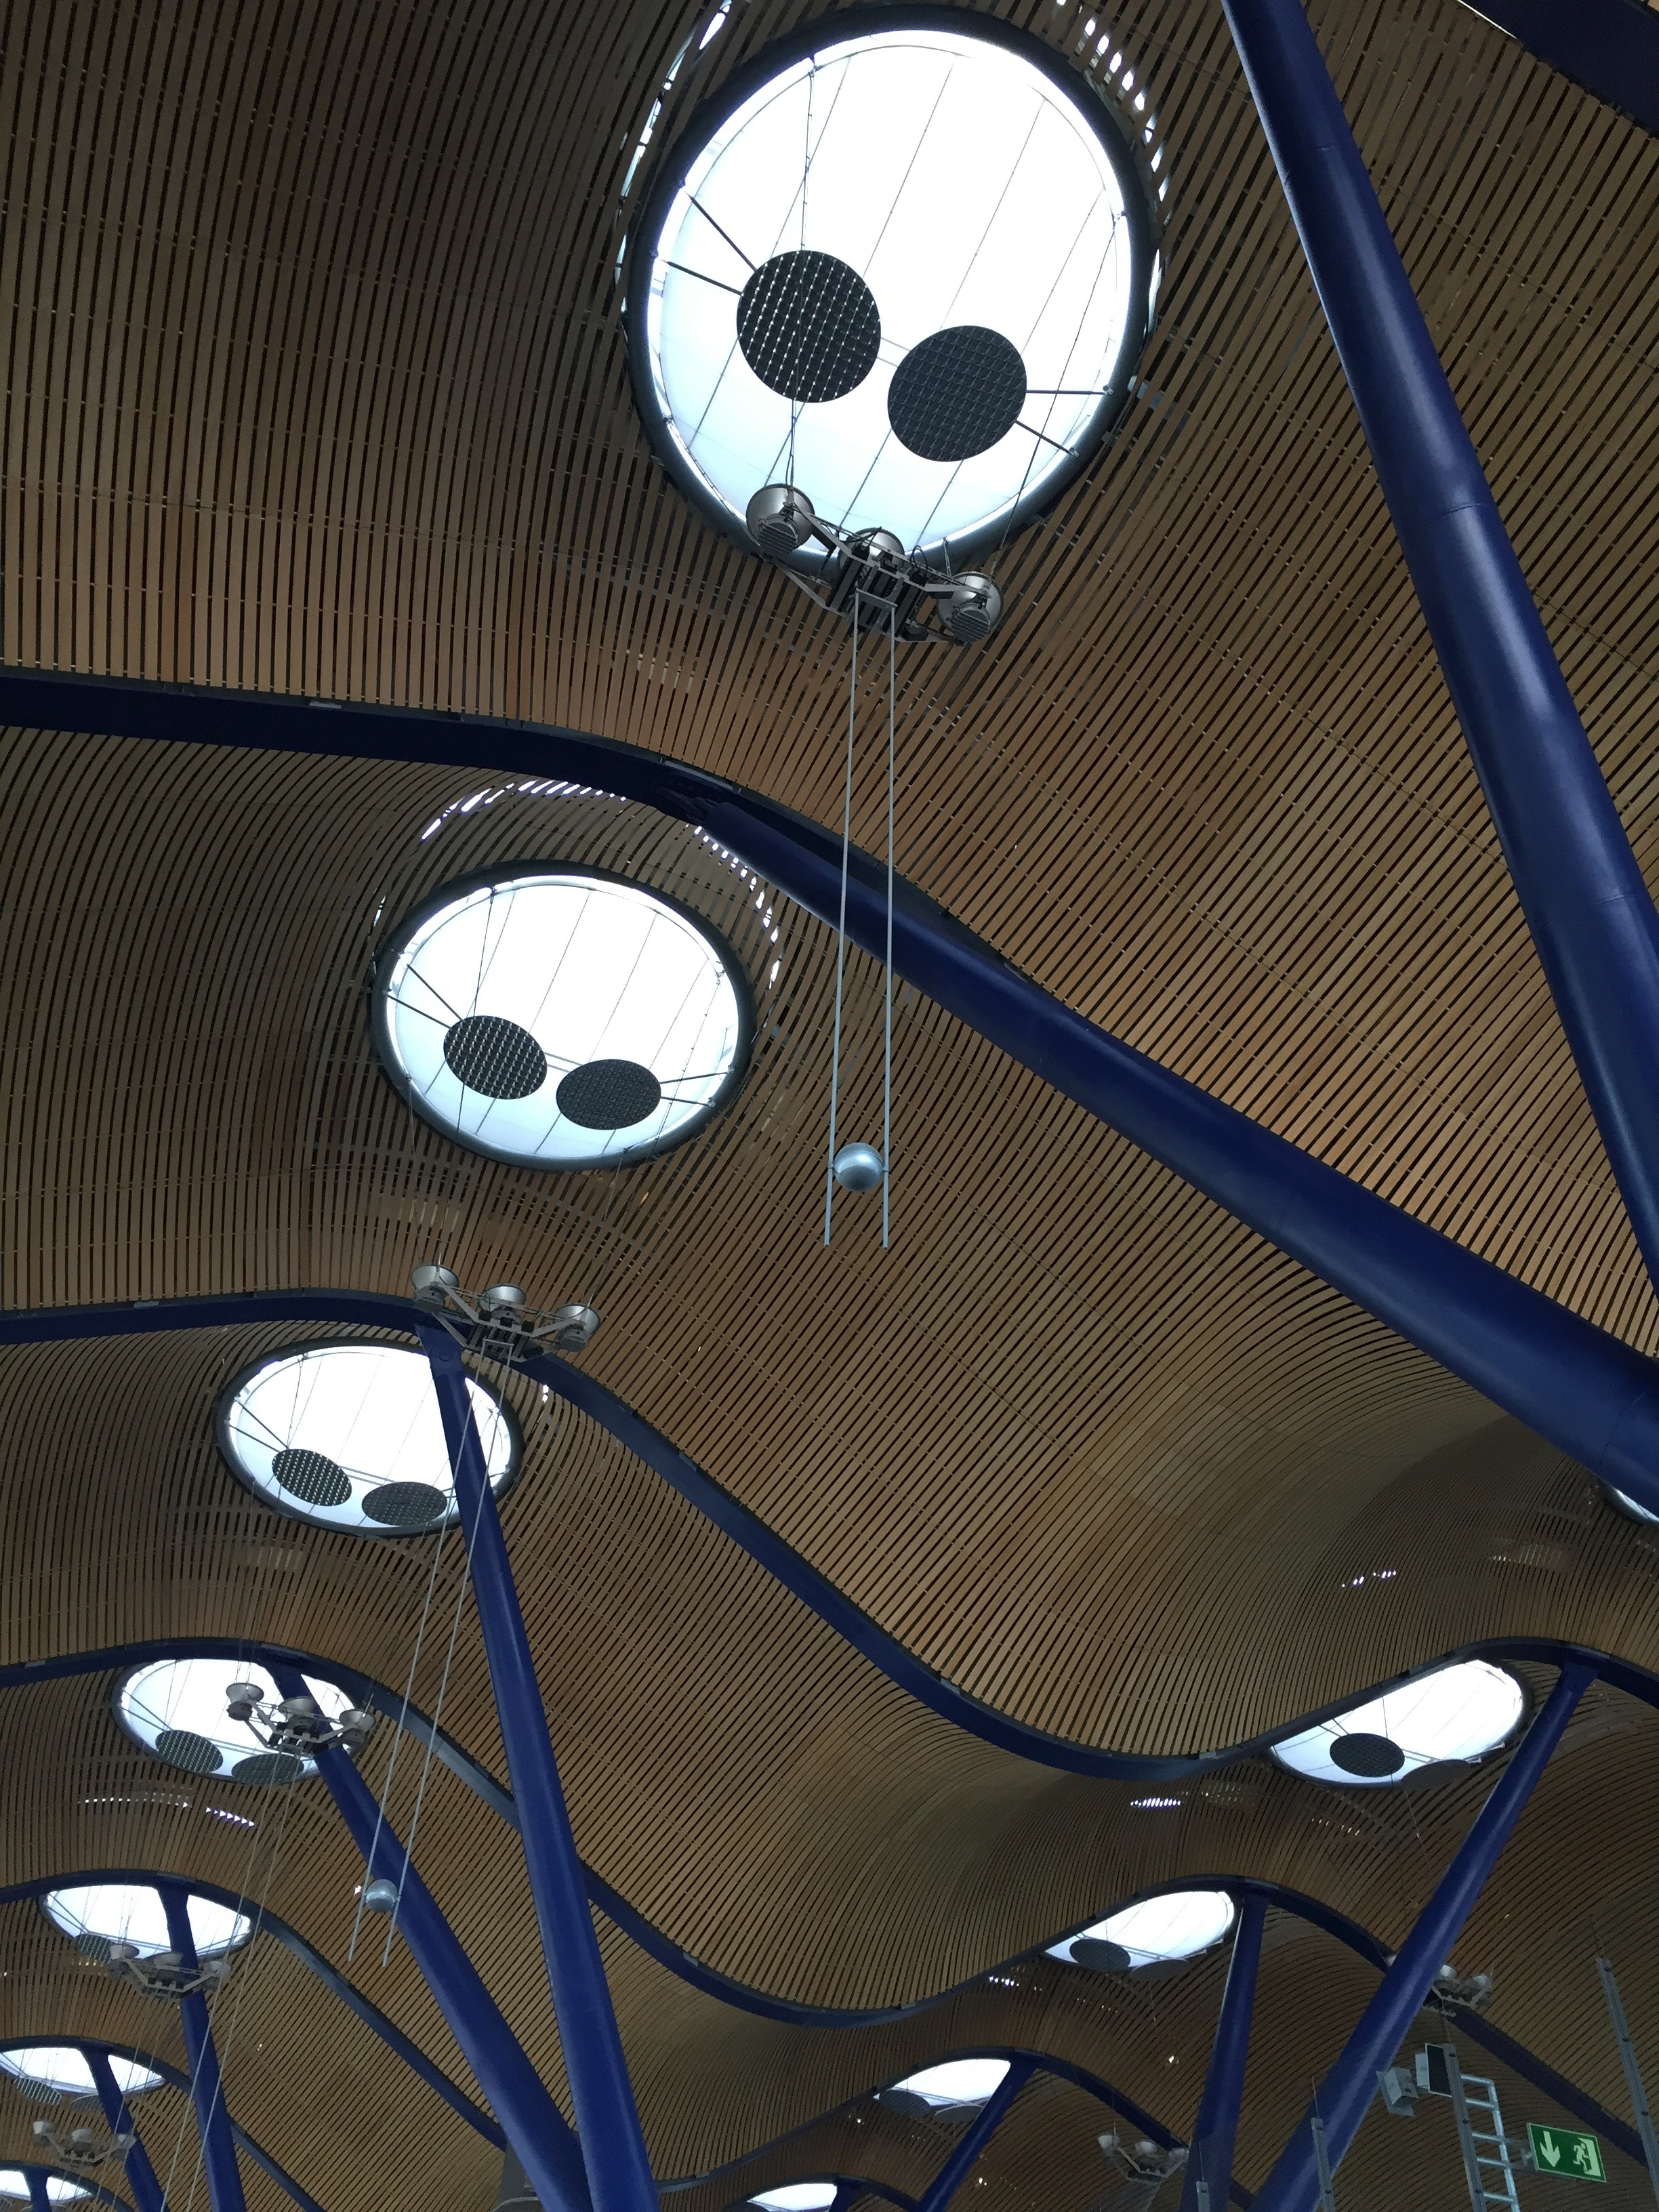 Adolfo Suárez Madrid–Barajas Airport, Madrid